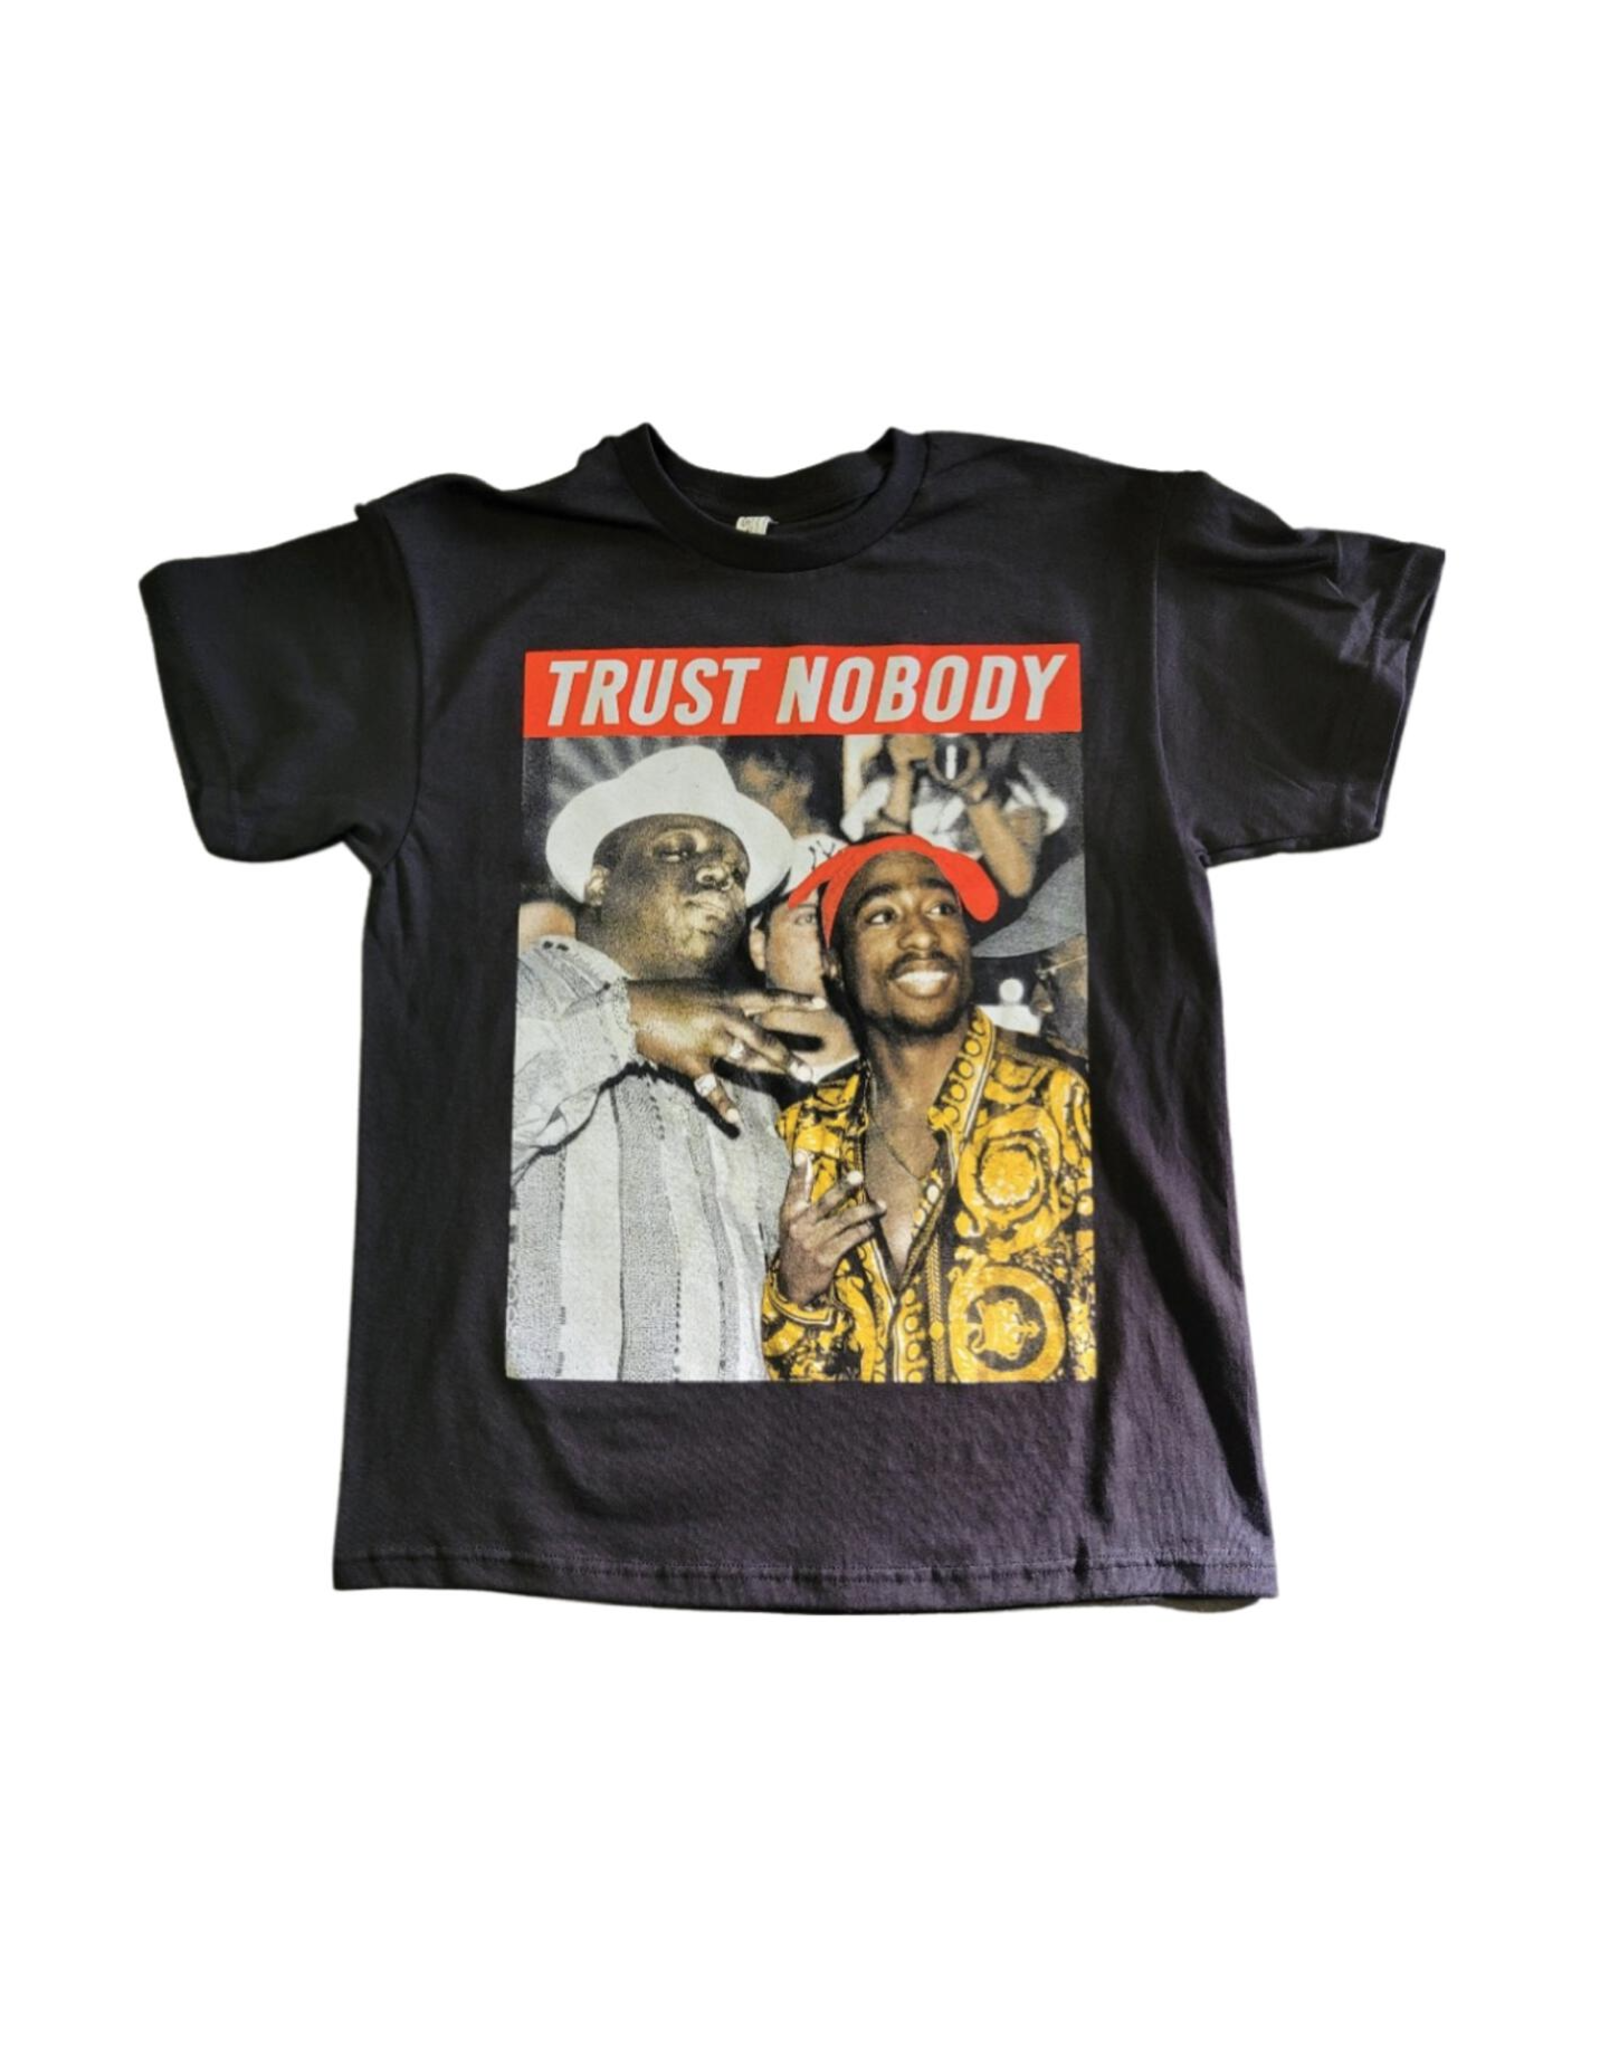 Pac & Big Trust Nobody Tee